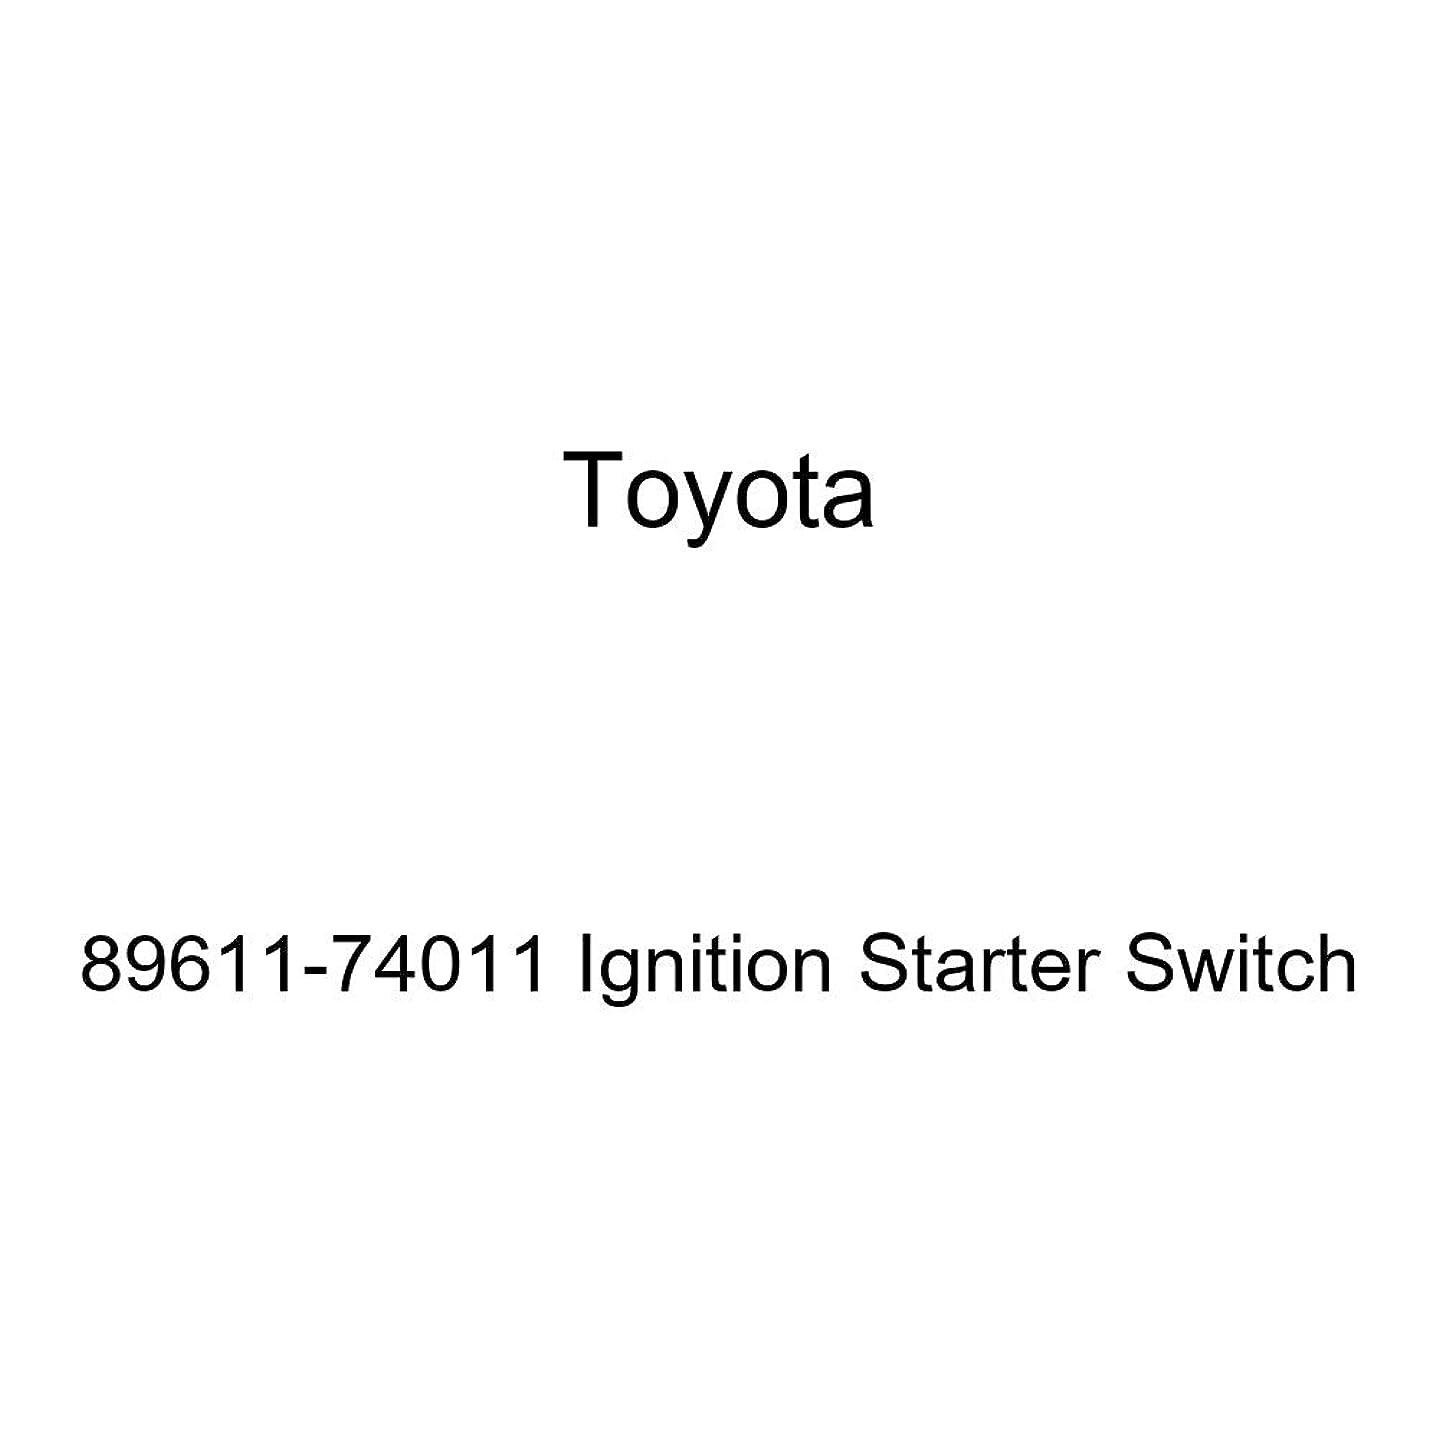 Toyota 89611-74011 Ignition Starter Switch